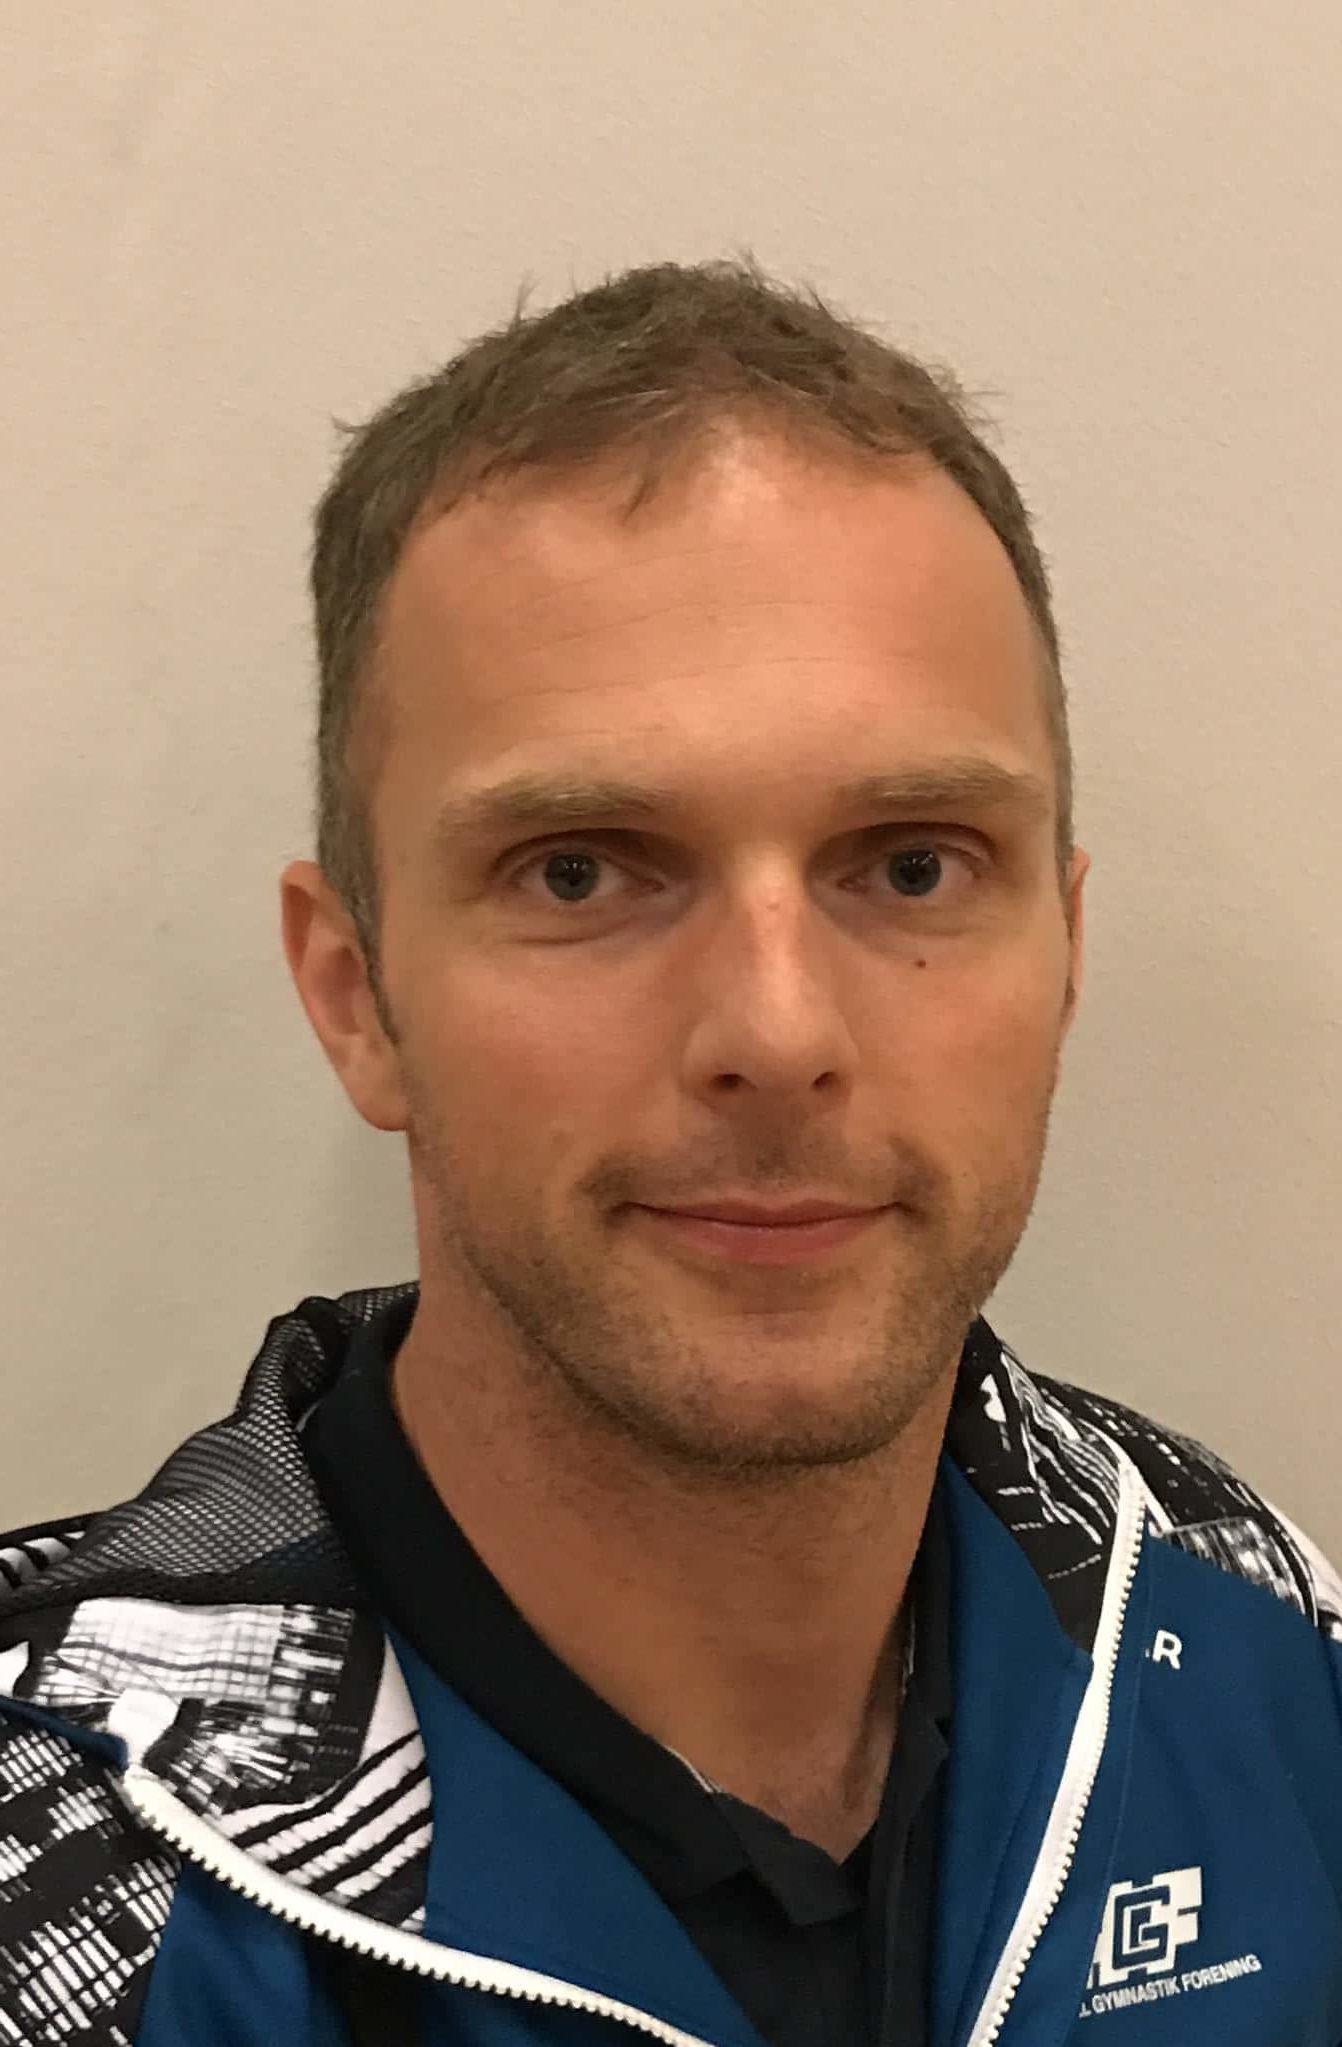 Thomas Briton Vestergaard